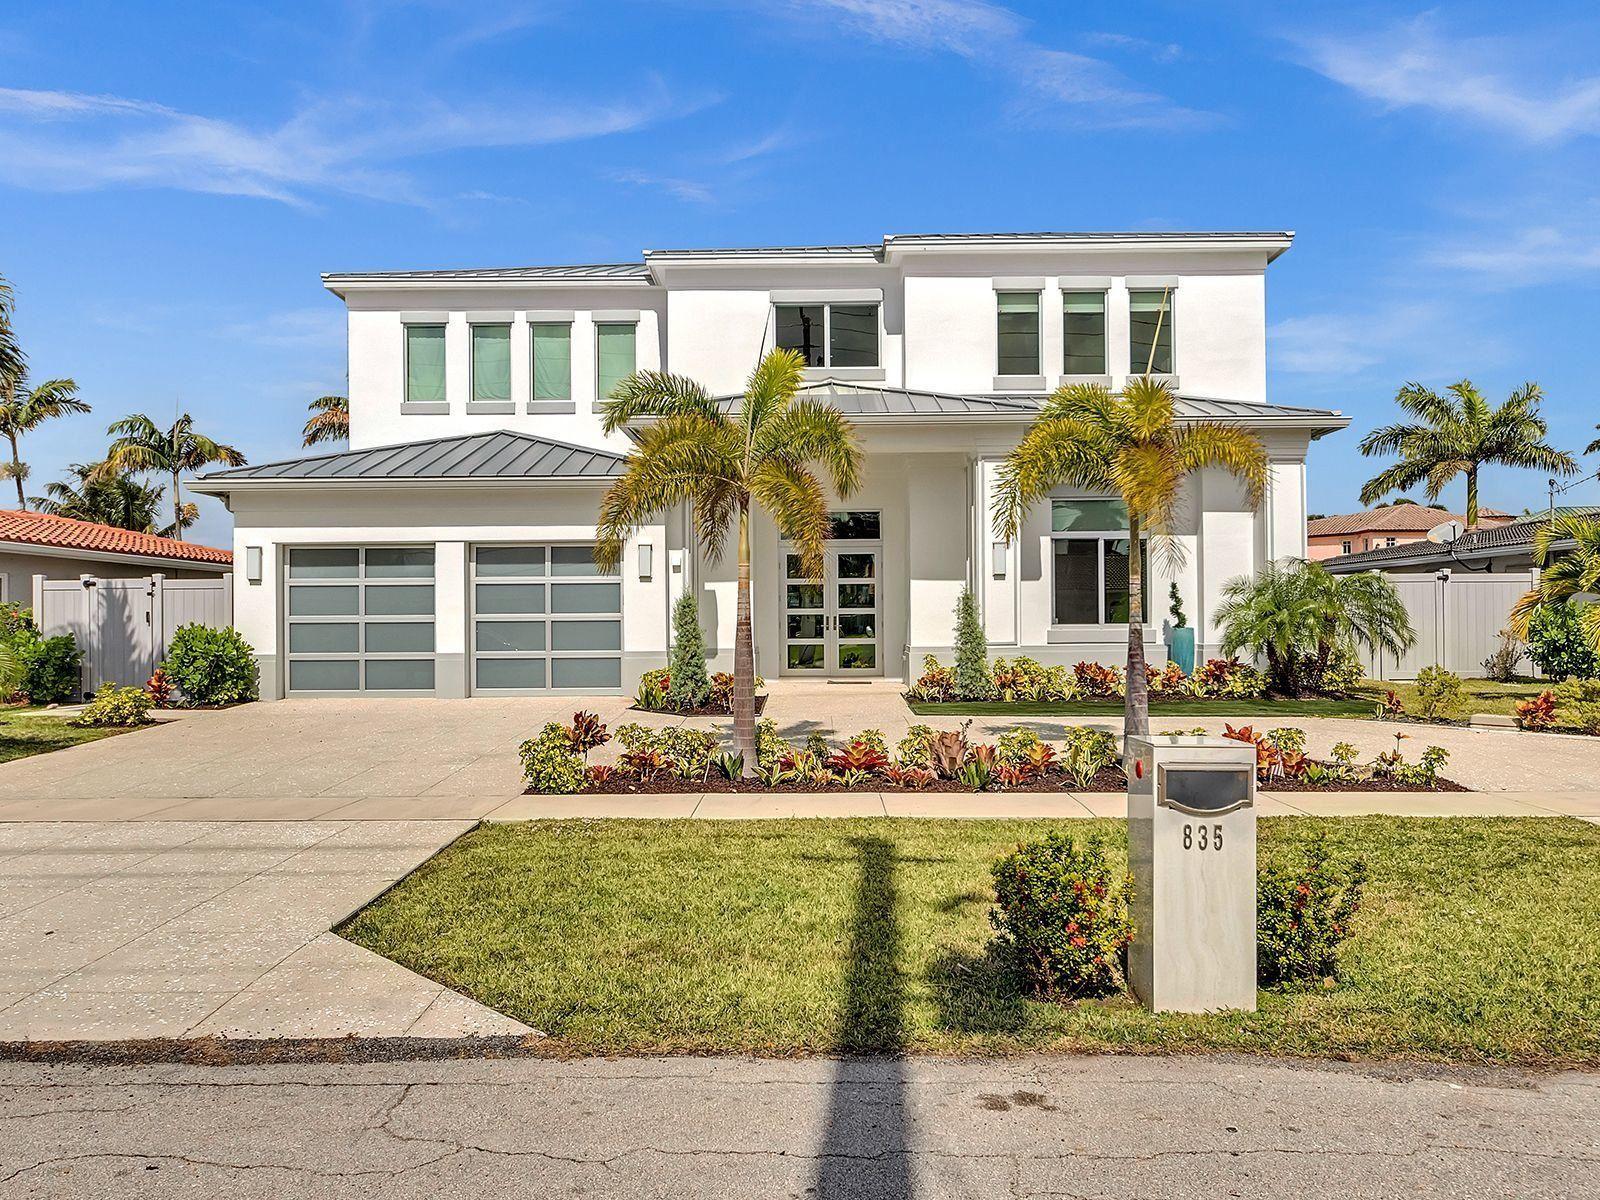 835 Appleby Street, Boca Raton, FL 33487 - #: RX-10691710